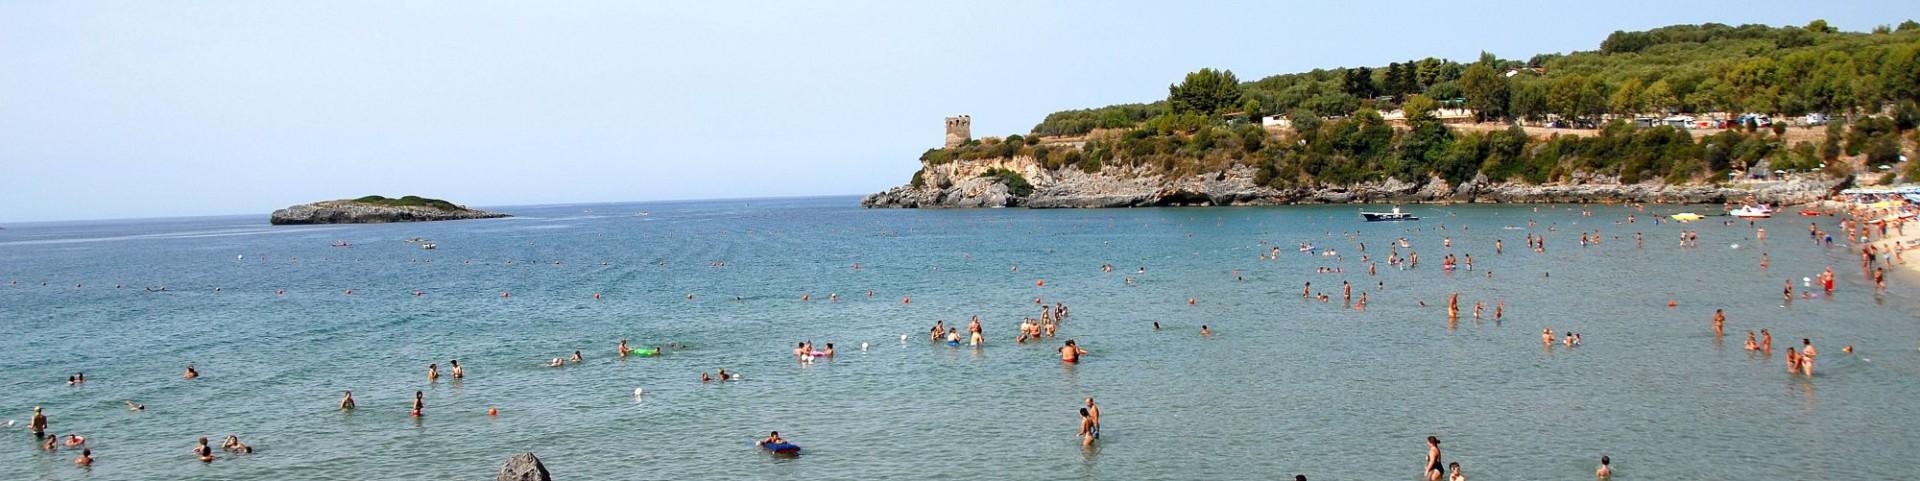 Marina di Camerota, ústřední pláž Calanca